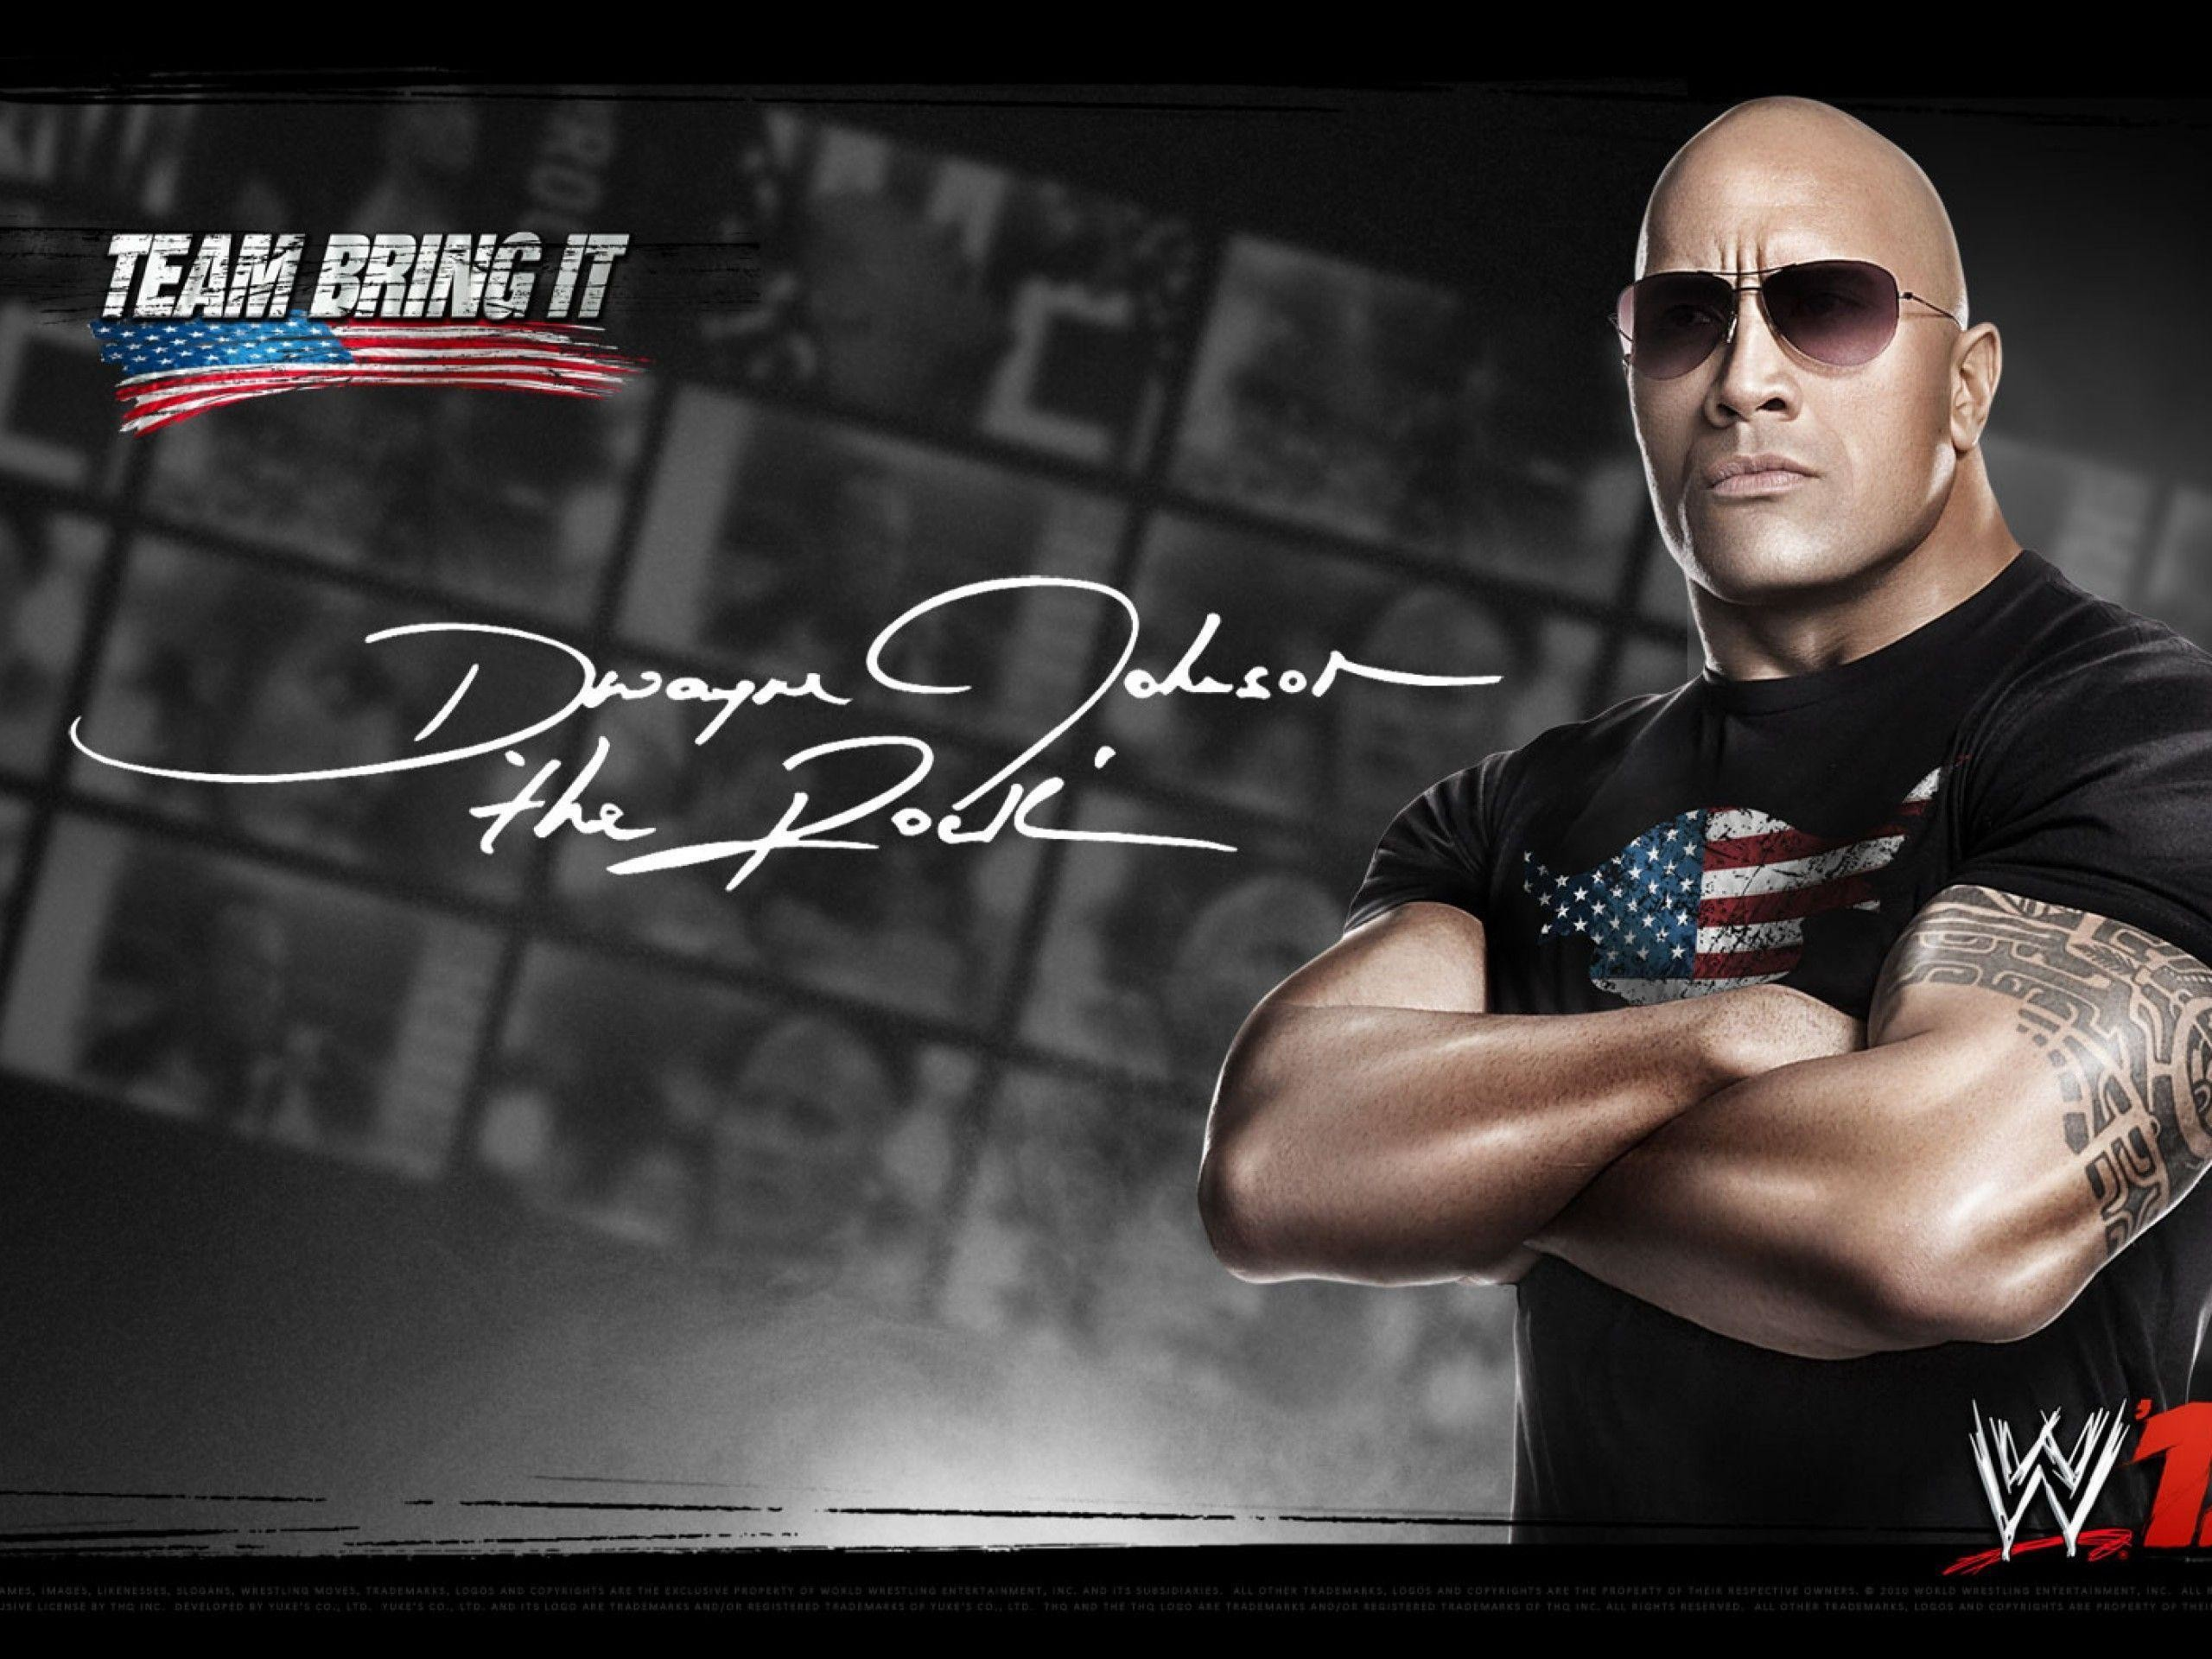 WWE HD Wallpapers for PC Desktop Dowload Free